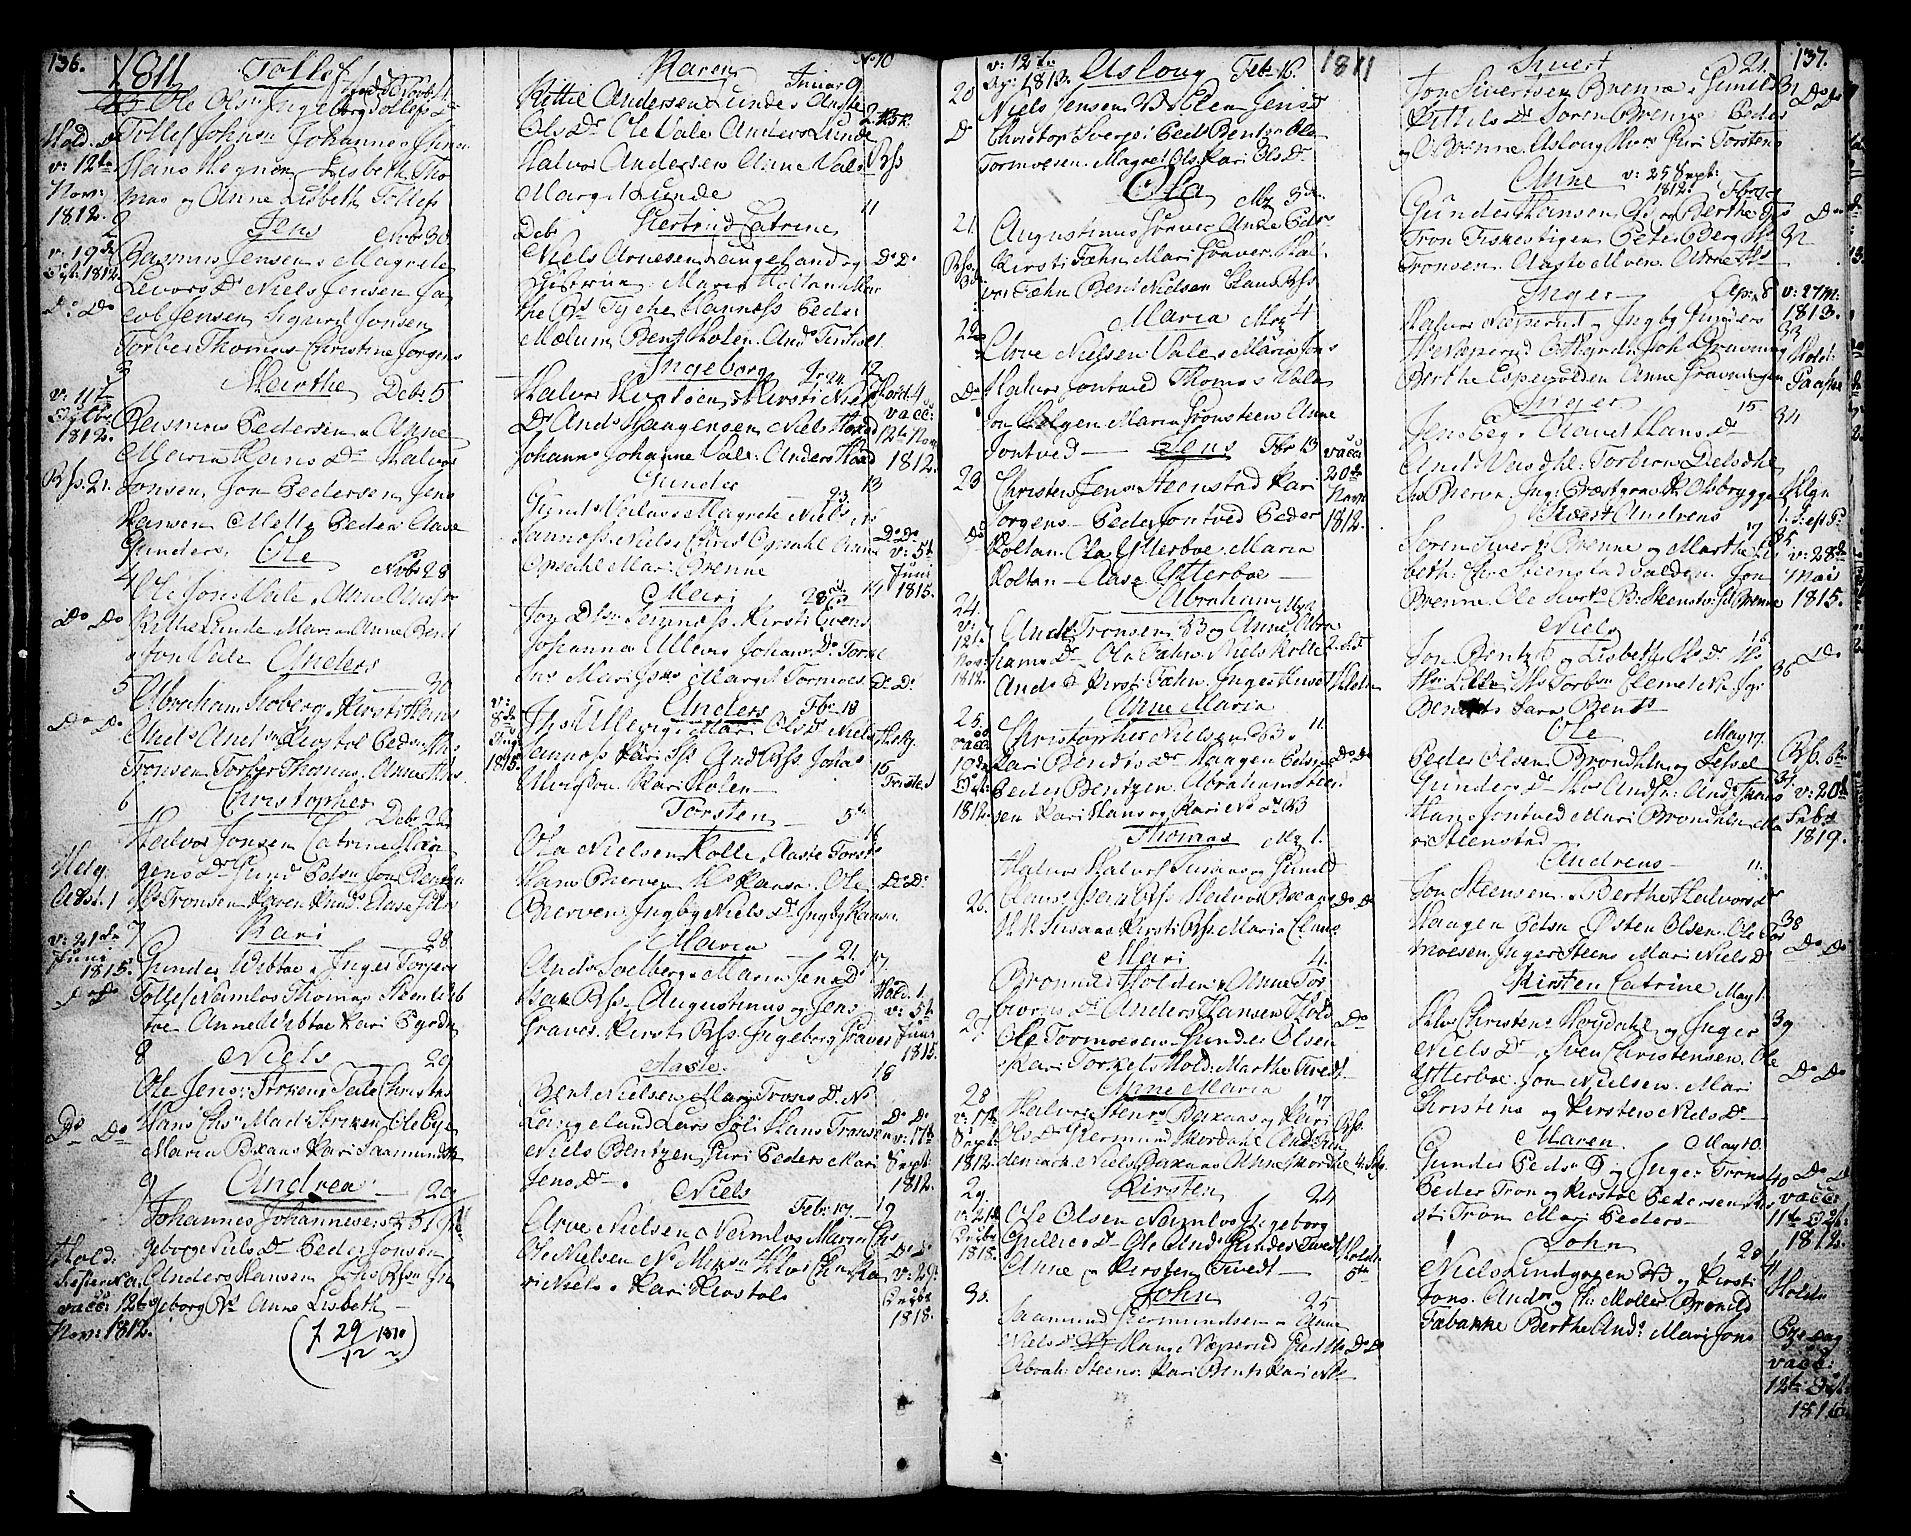 SAKO, Holla kirkebøker, F/Fa/L0002: Ministerialbok nr. 2, 1779-1814, s. 136-137